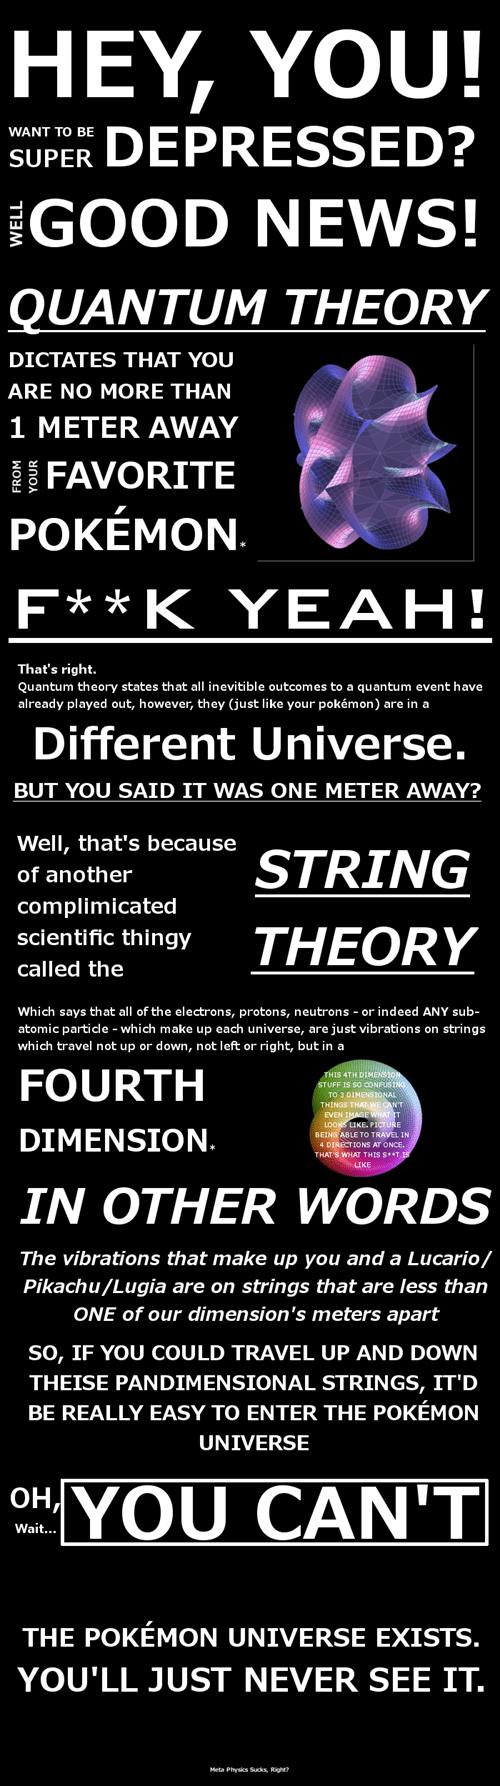 Pokémon universes quantum theory - 7950443264